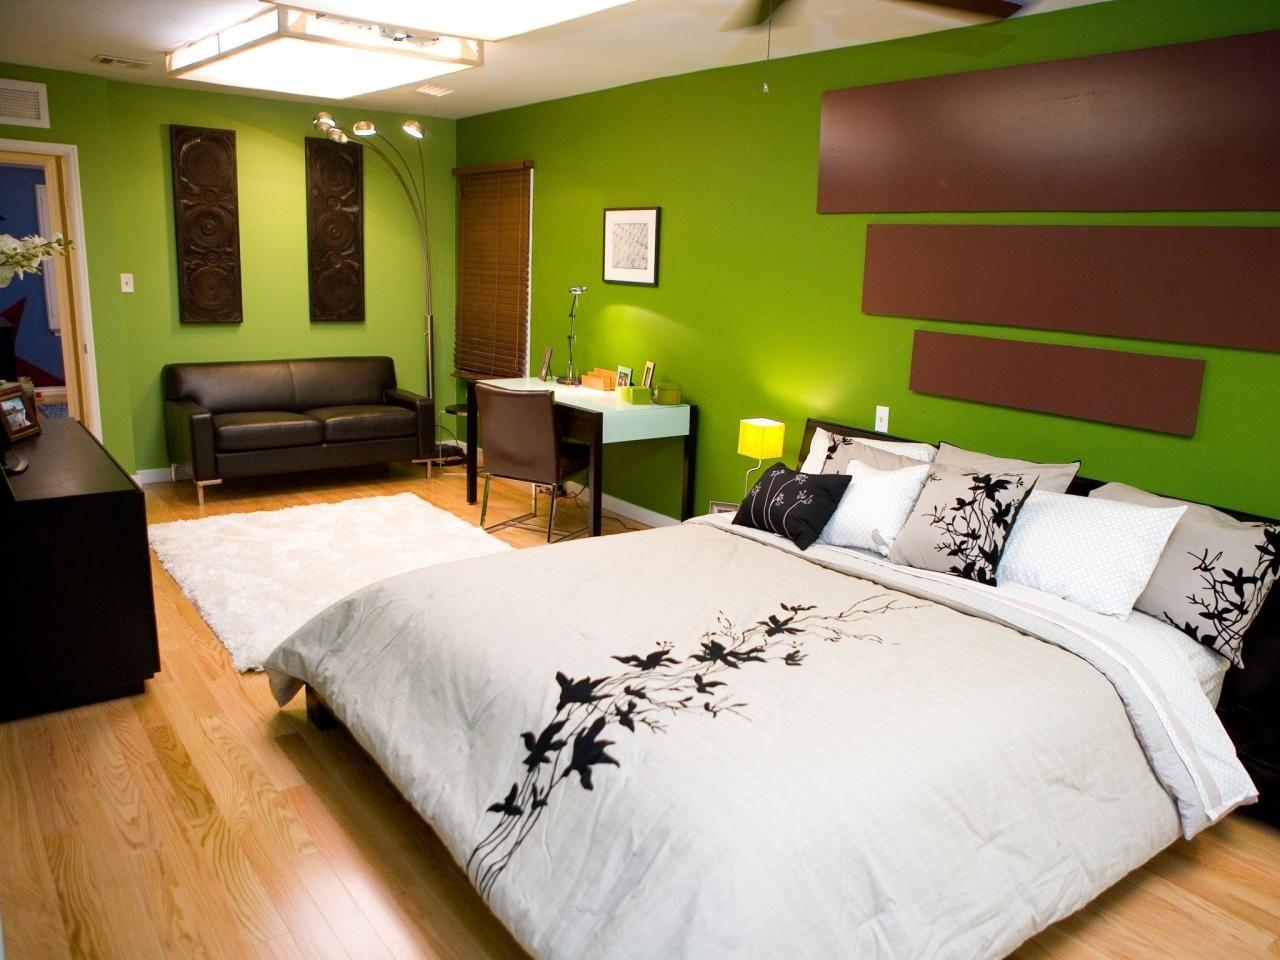 Bedroom Color Paint Ideas Design Teenage Bedroom Color Schemes Pictures Options & Ideas